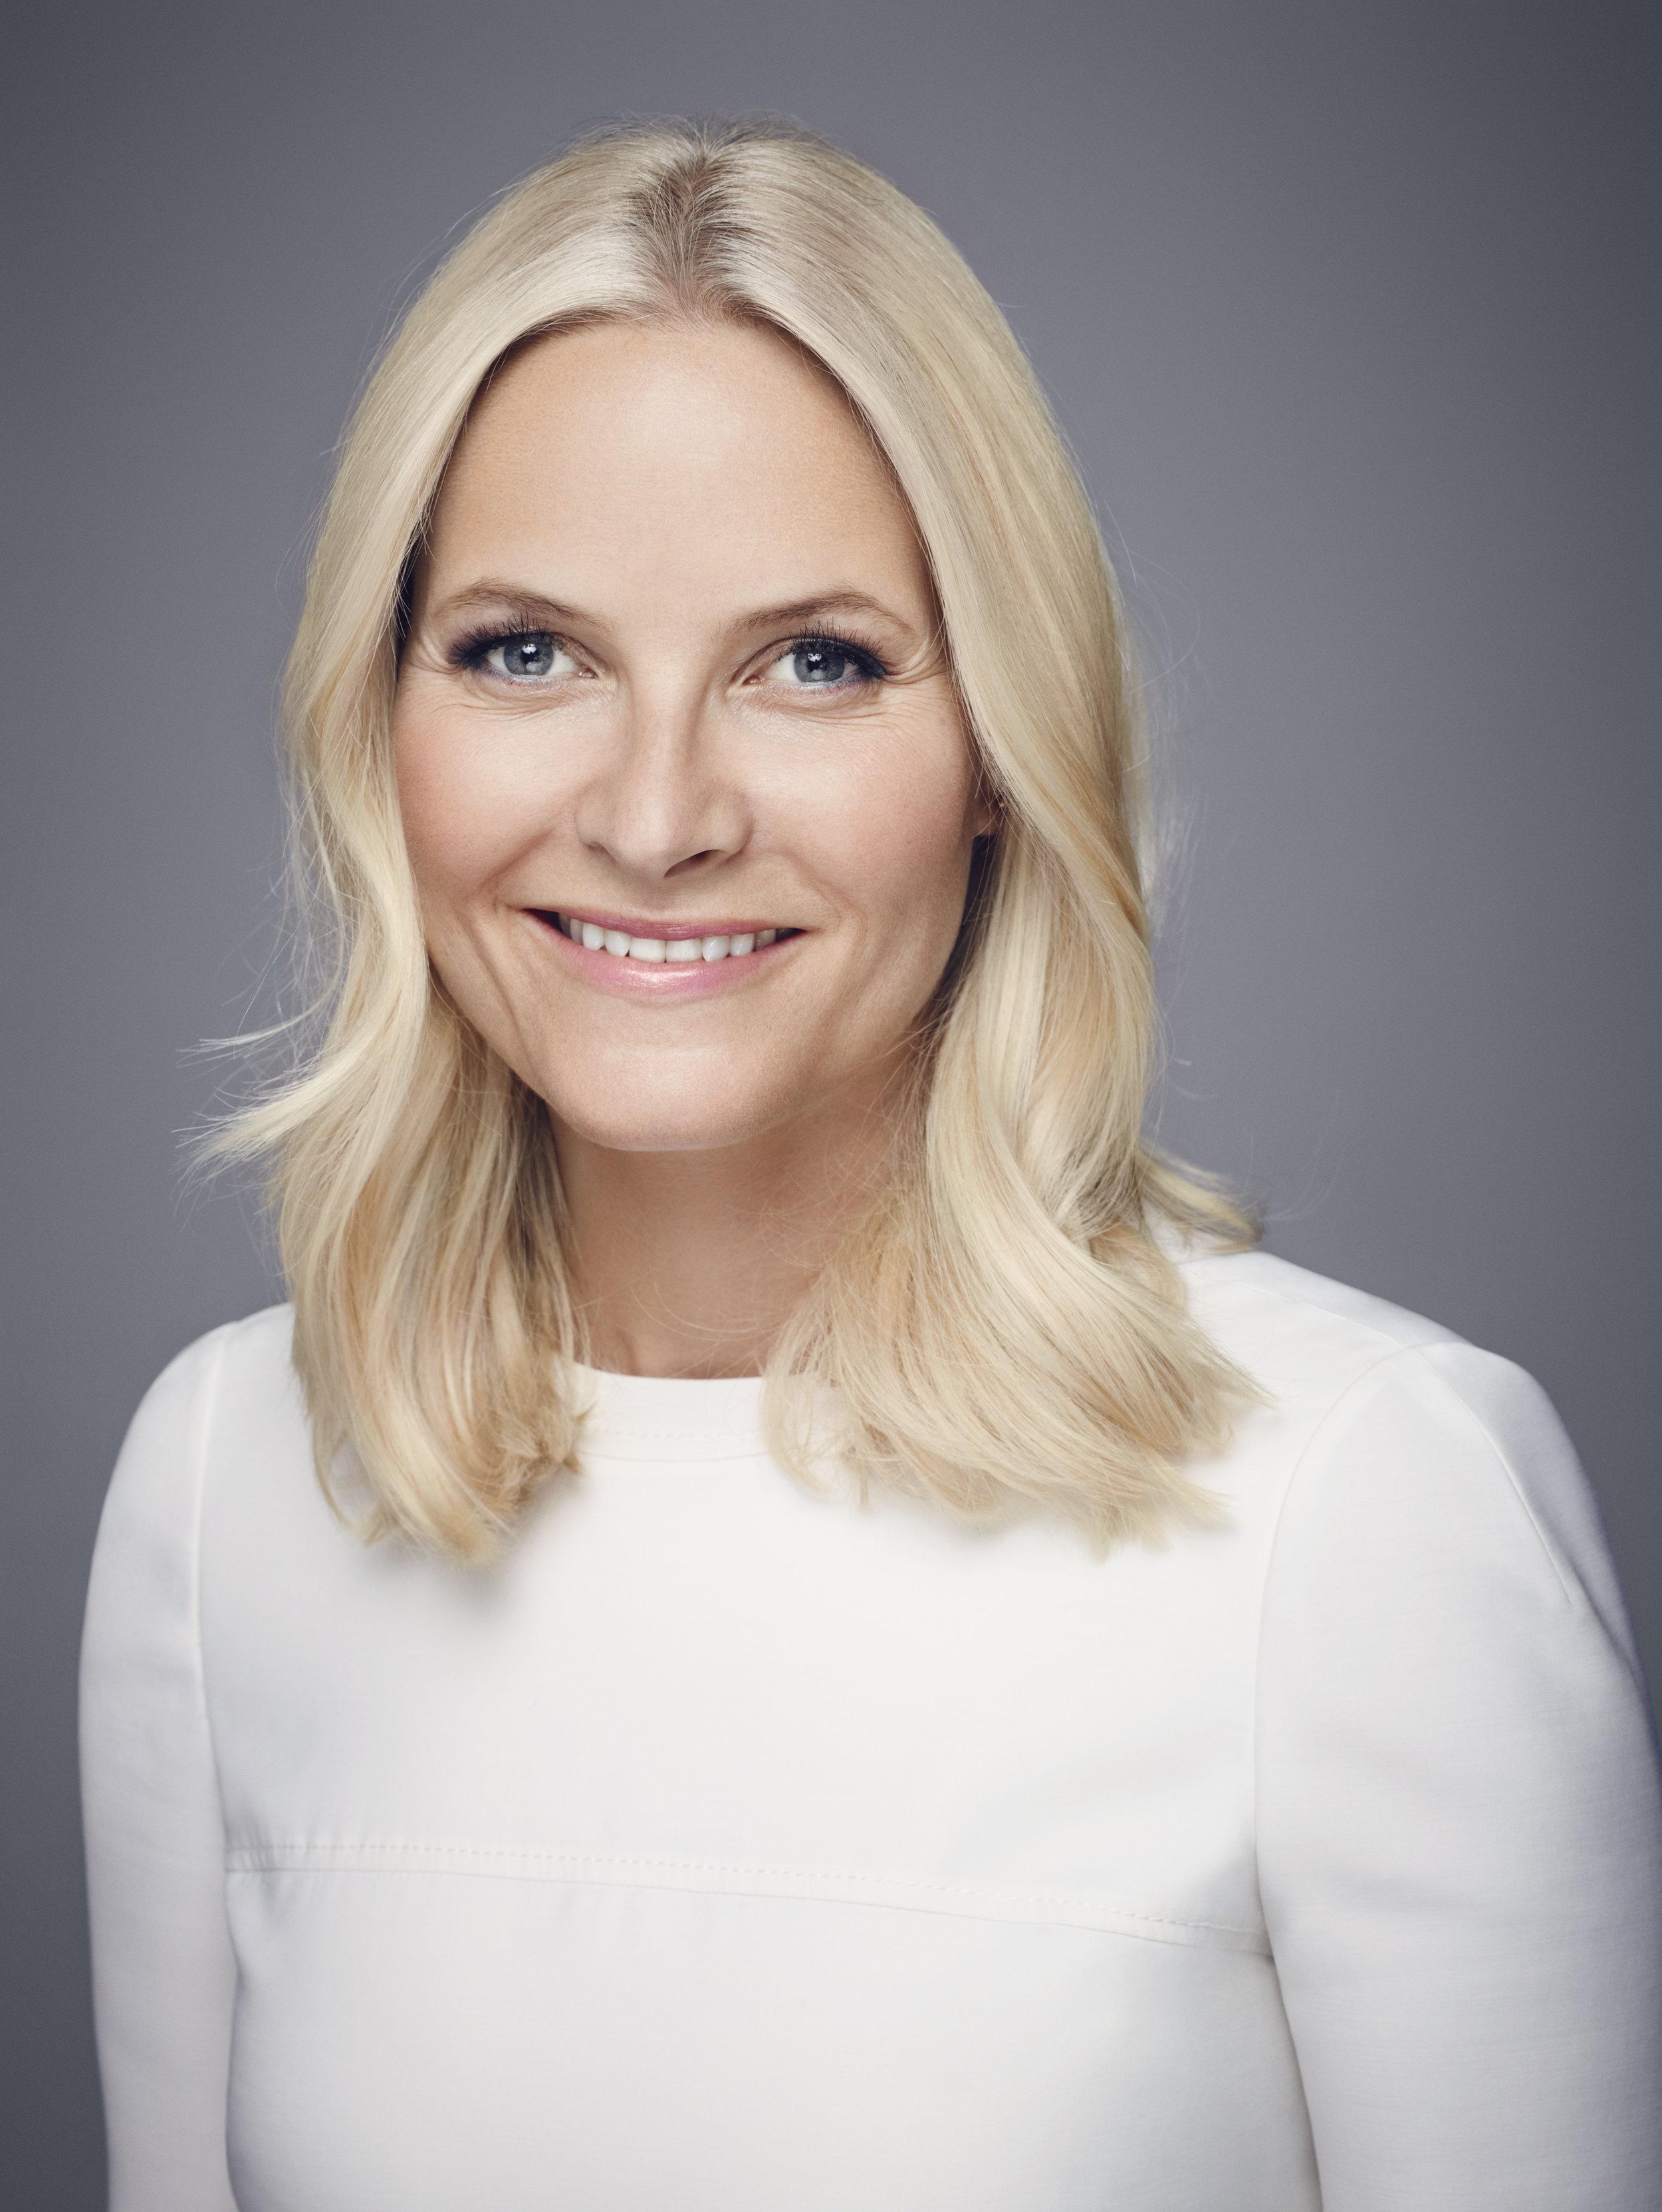 Kronprinzessin Mette-Marit  Foto:Sølve Sundsbø, Det kongelige hoff